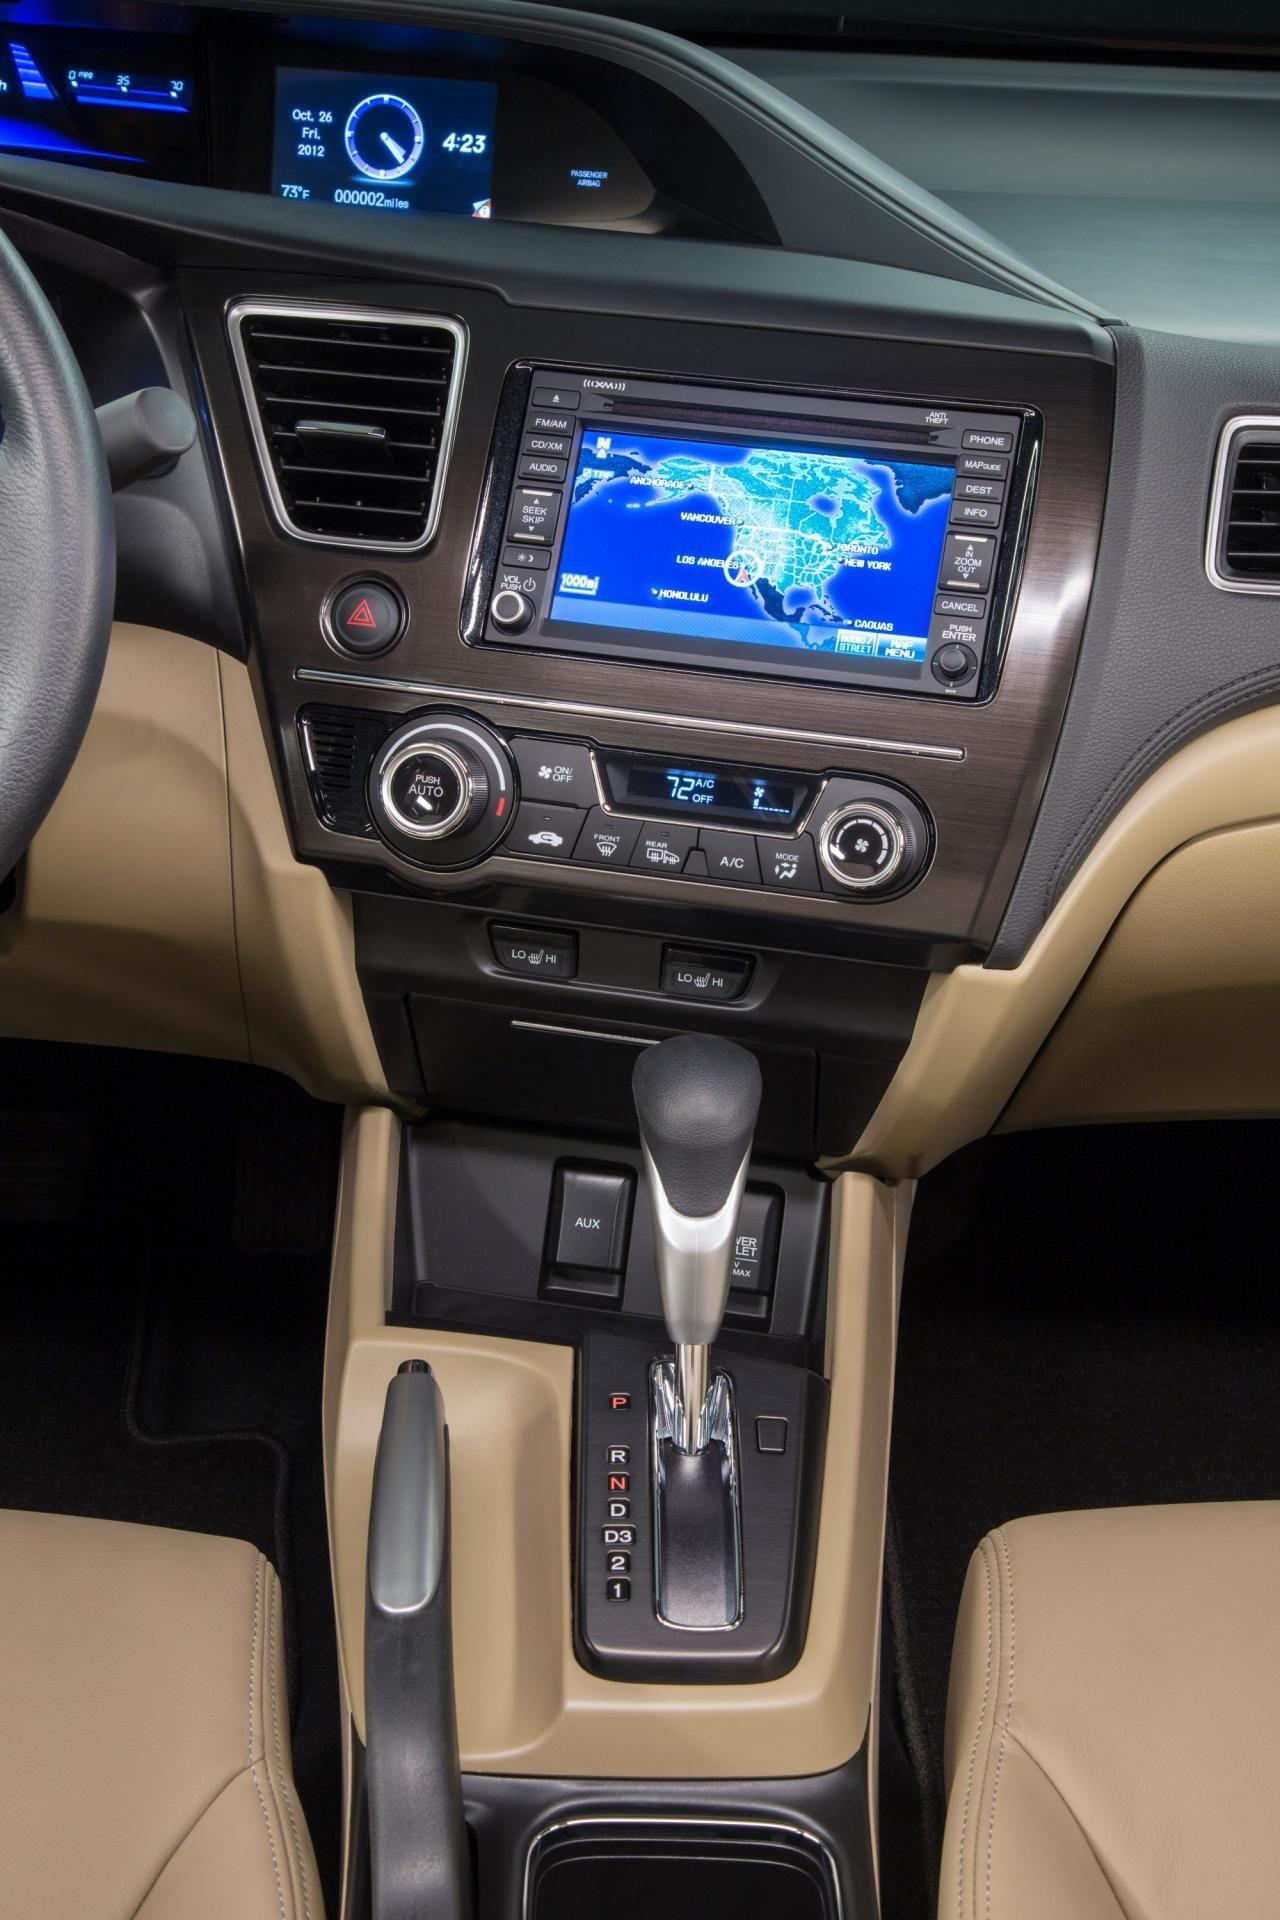 2013 Honda Civic Sedan Interior  Http://reddellhonda.com/searchnew.aspx?modelu003dCivic Sdn #Honda #HondaCivic  #HondaCars | Rice Rockets | Pinterest | 2013 ...